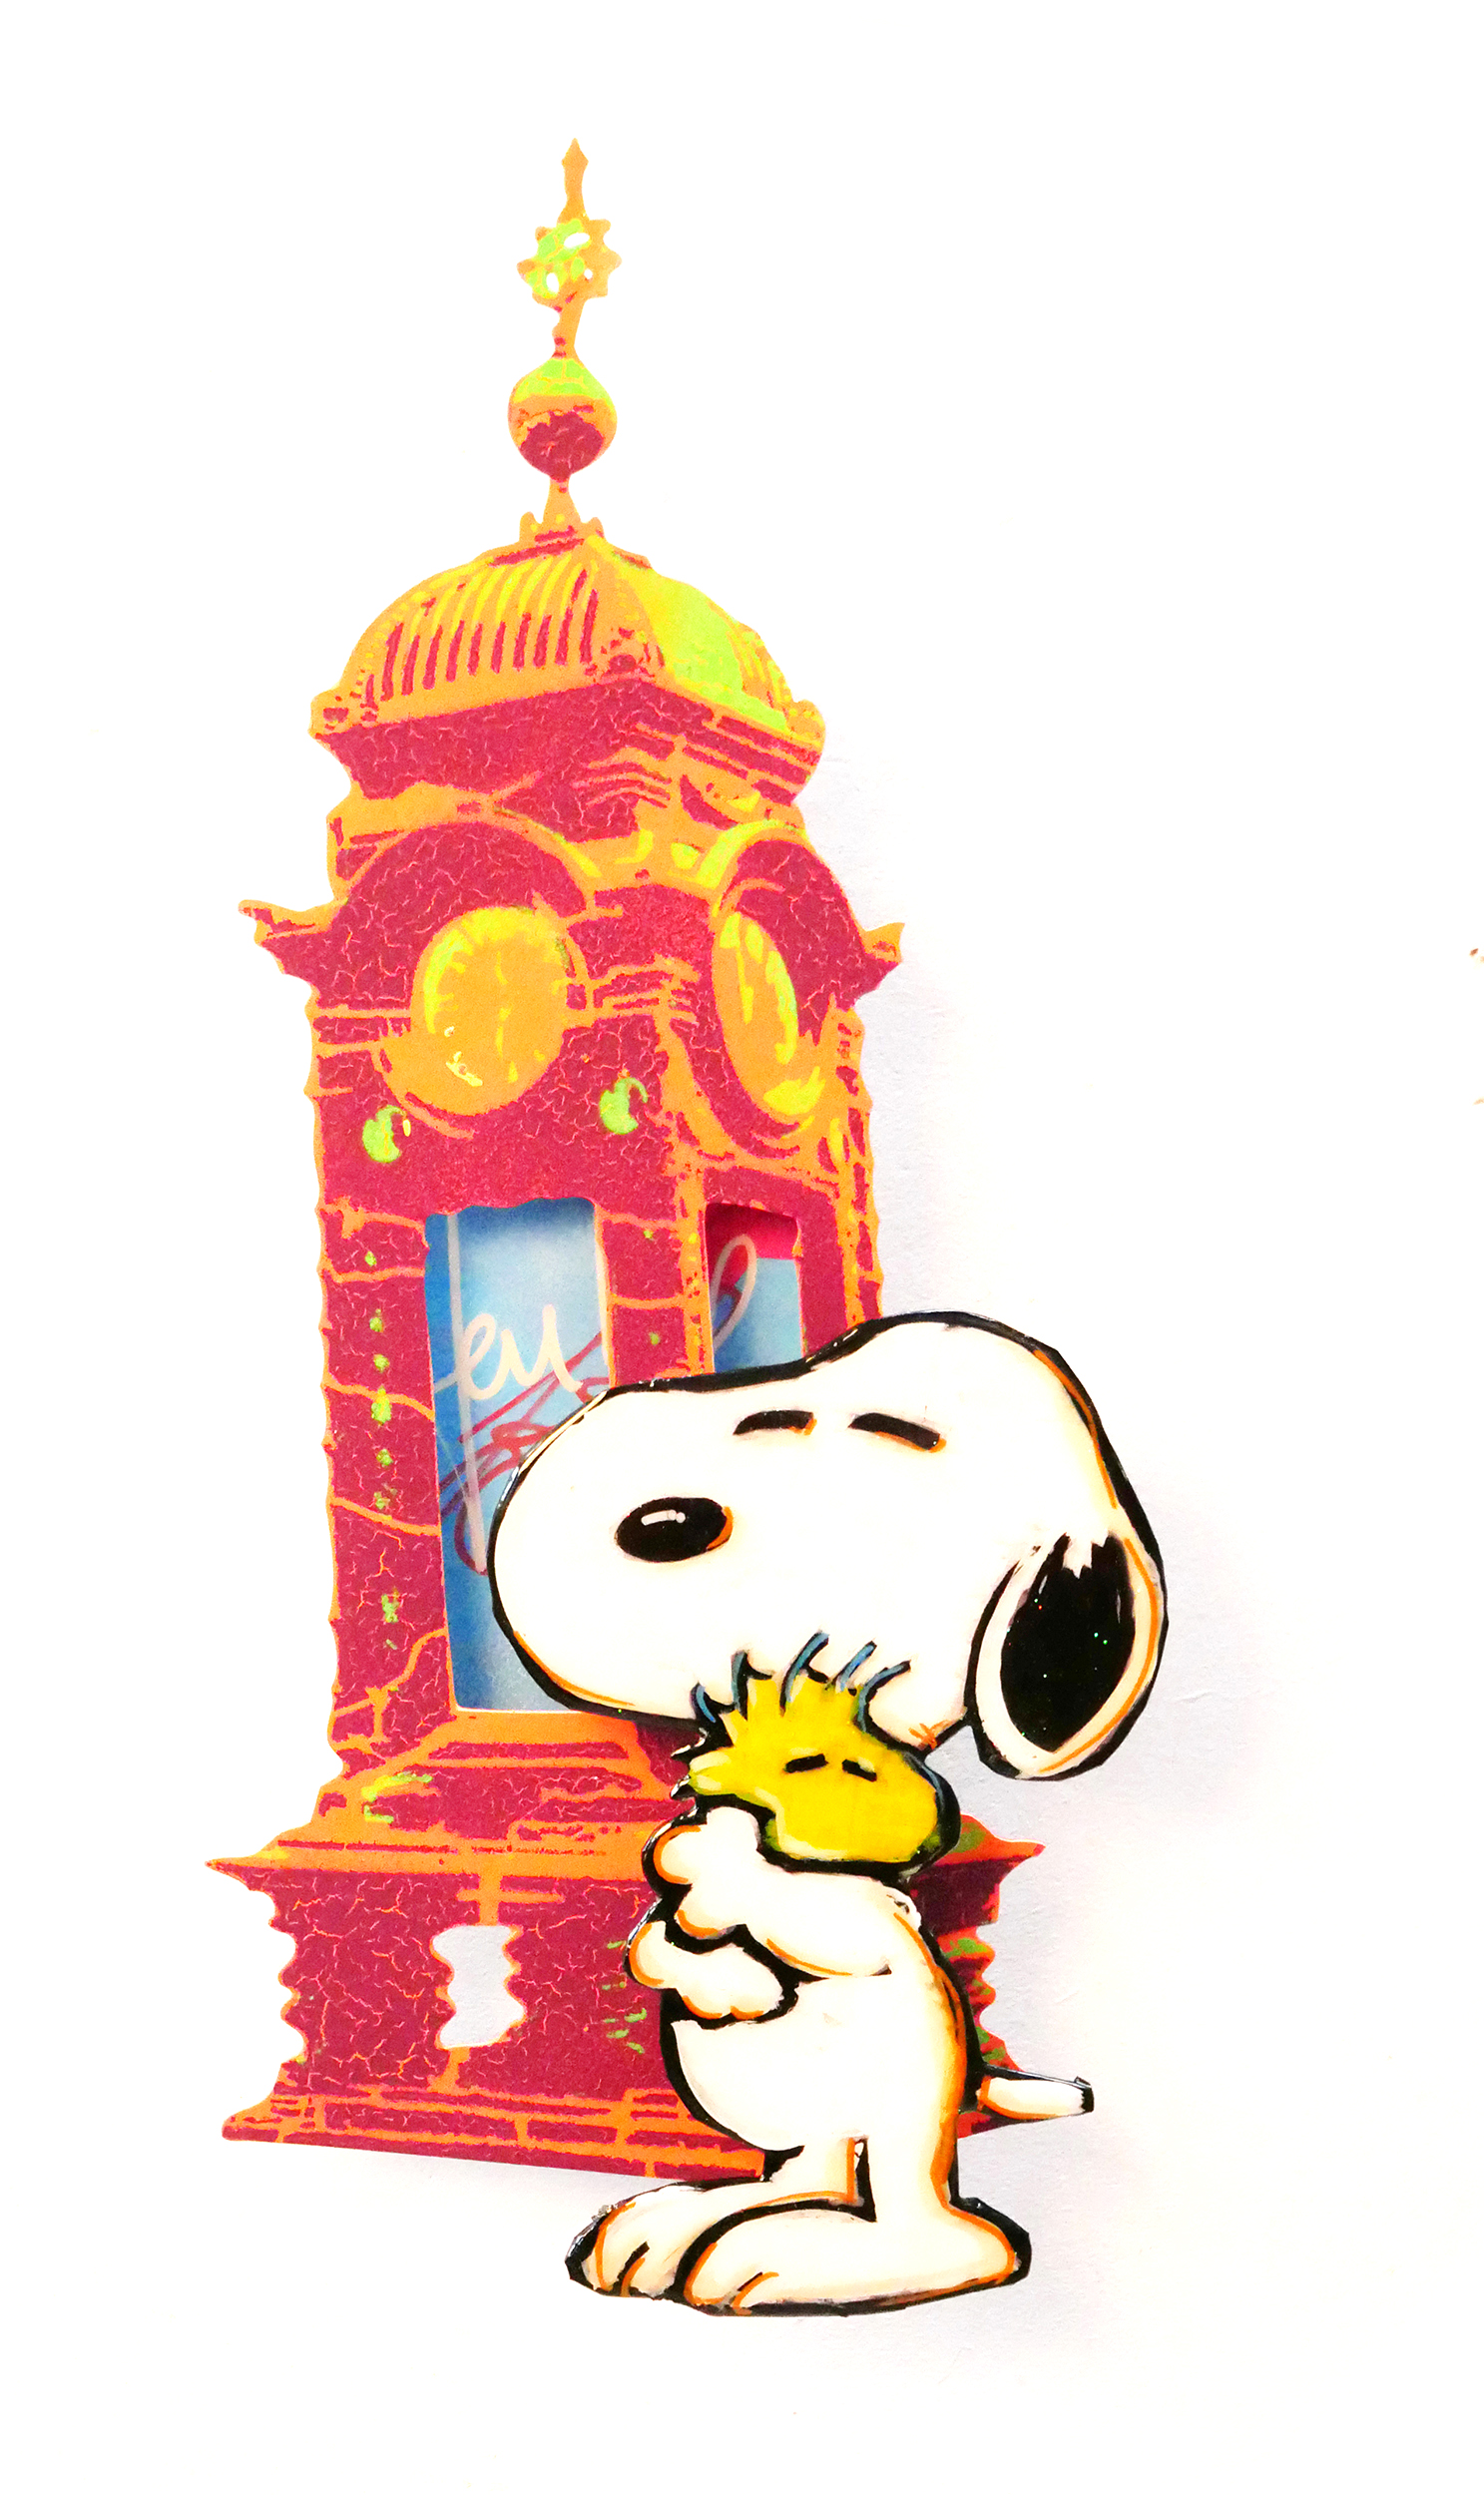 Tom Boston - An der Kröpcke Uhr (Snoopy) , 8017-006-944